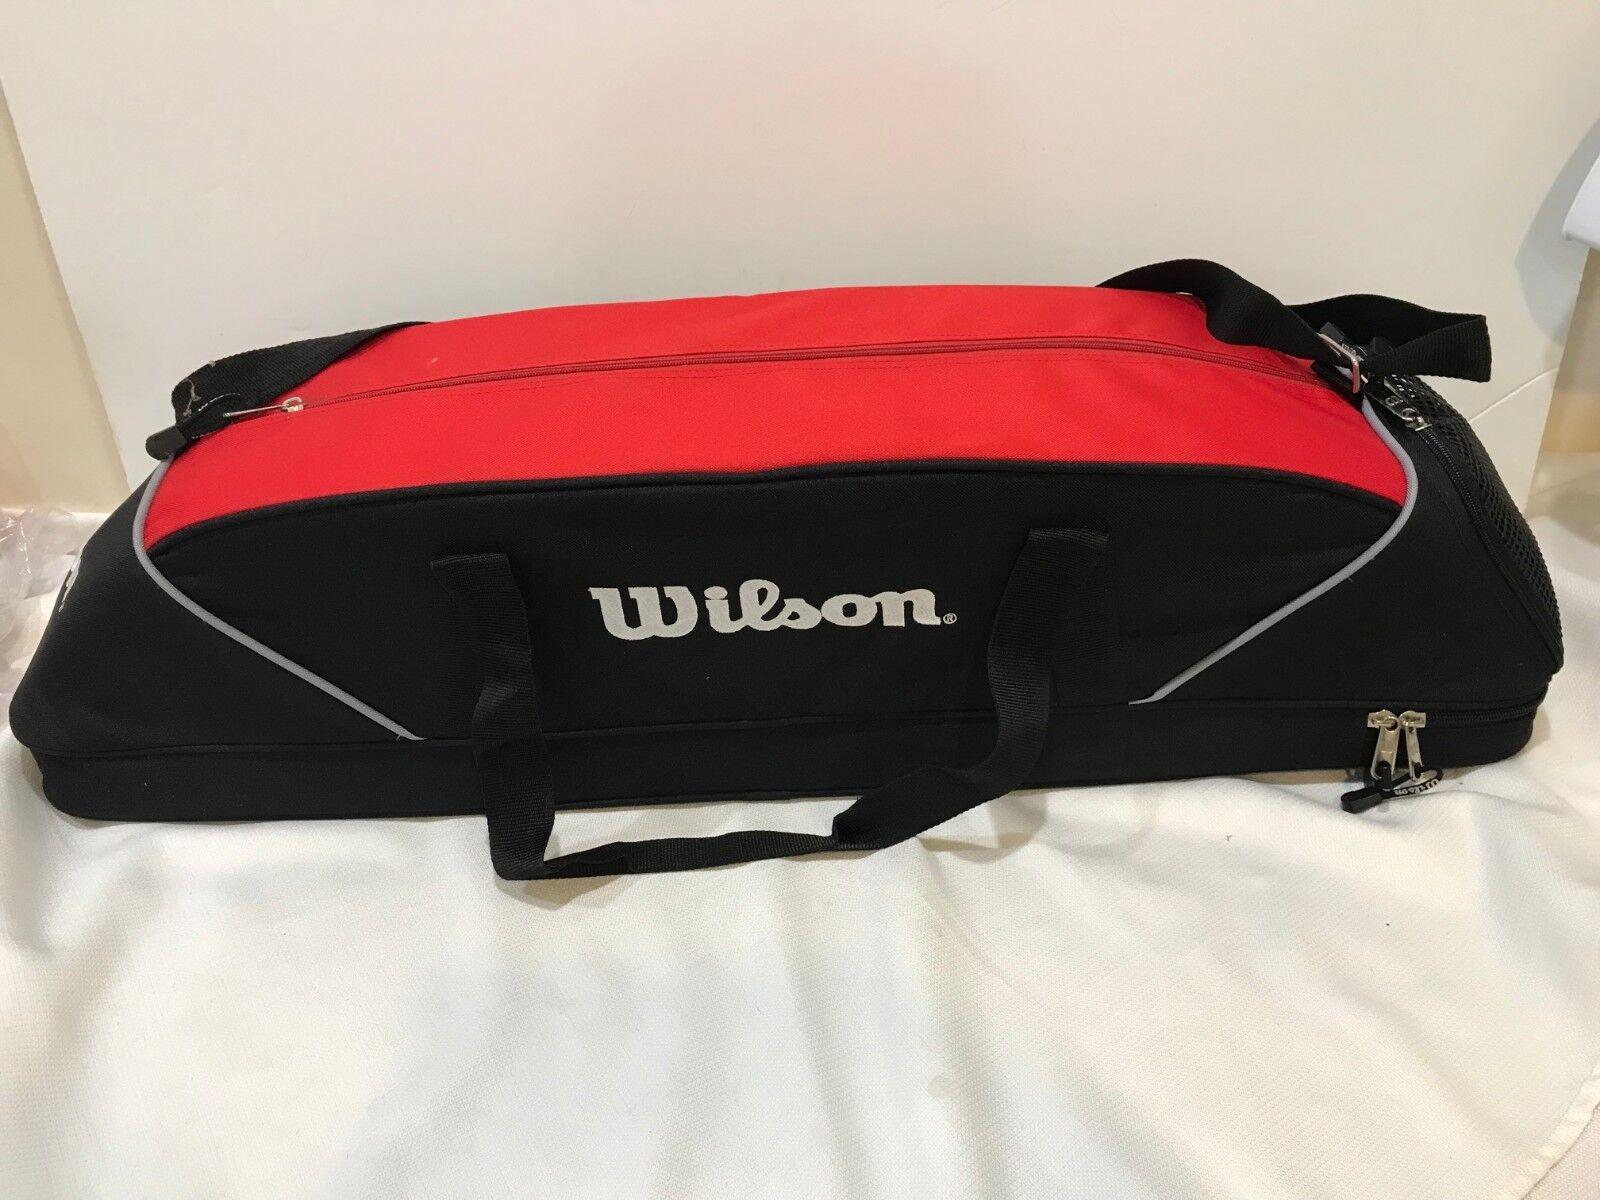 Wilson Gear Baseball Bag Red Black Holds Bats Helmet Balls M